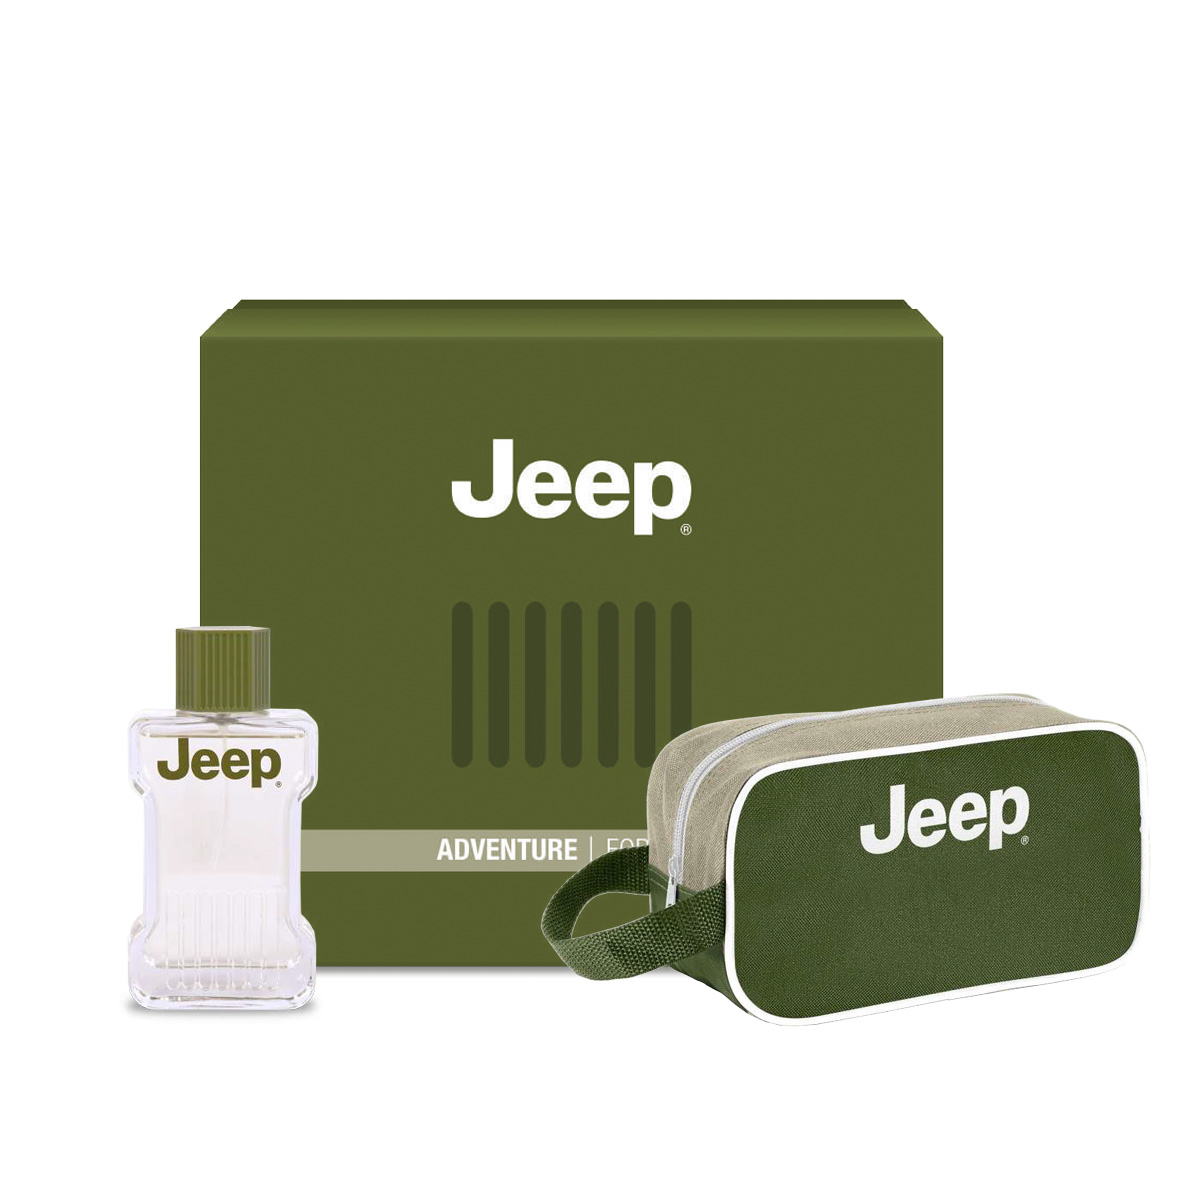 Jeep Adventure Beauty Case Ufficiale Jeep